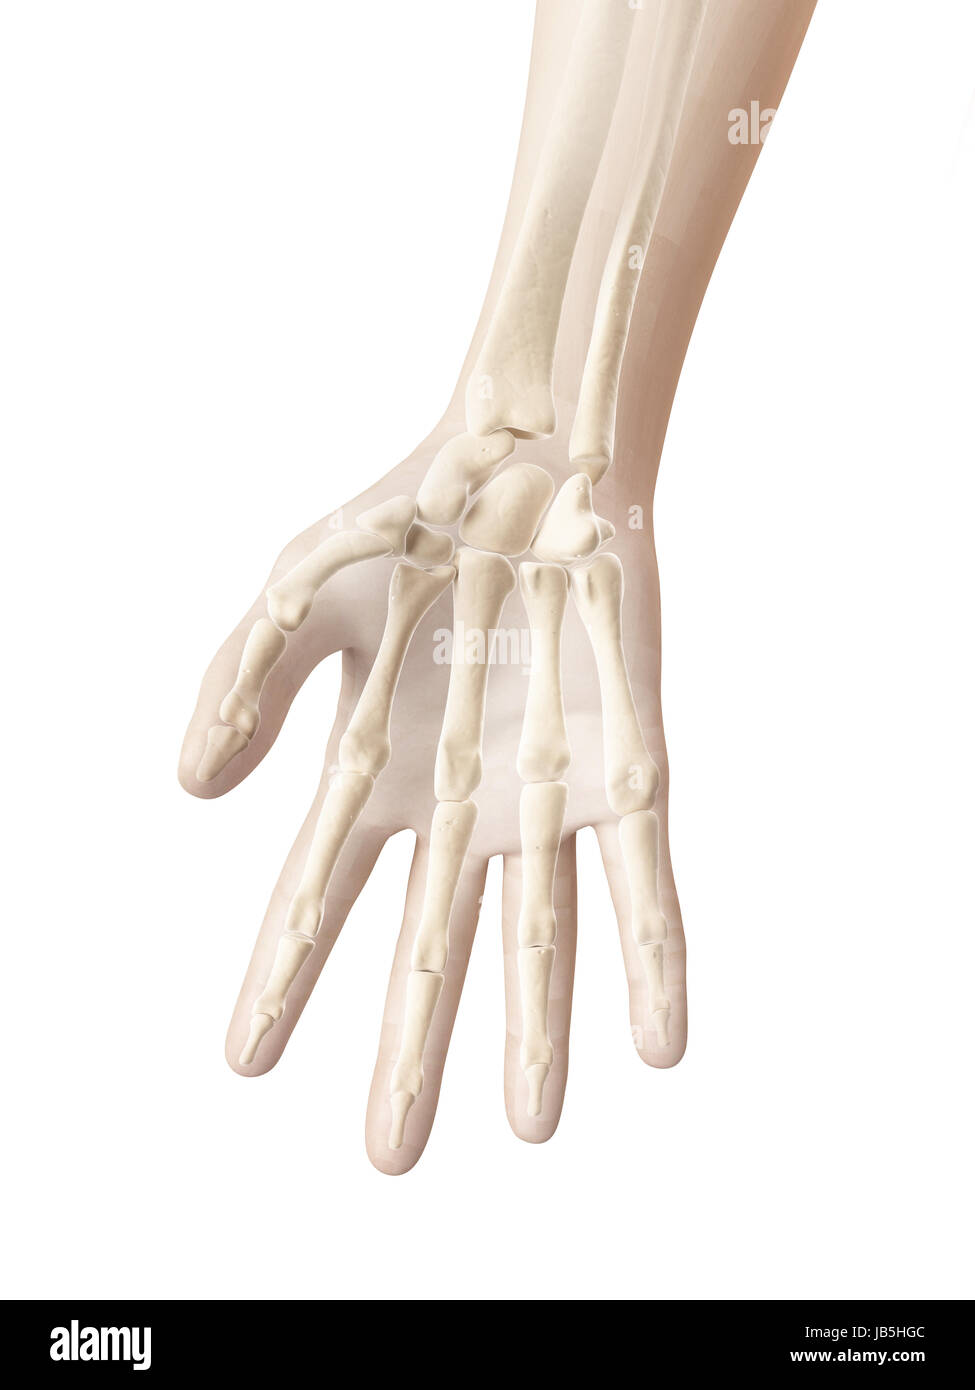 Wrist Bones Stock Photos Wrist Bones Stock Images Page 3 Alamy